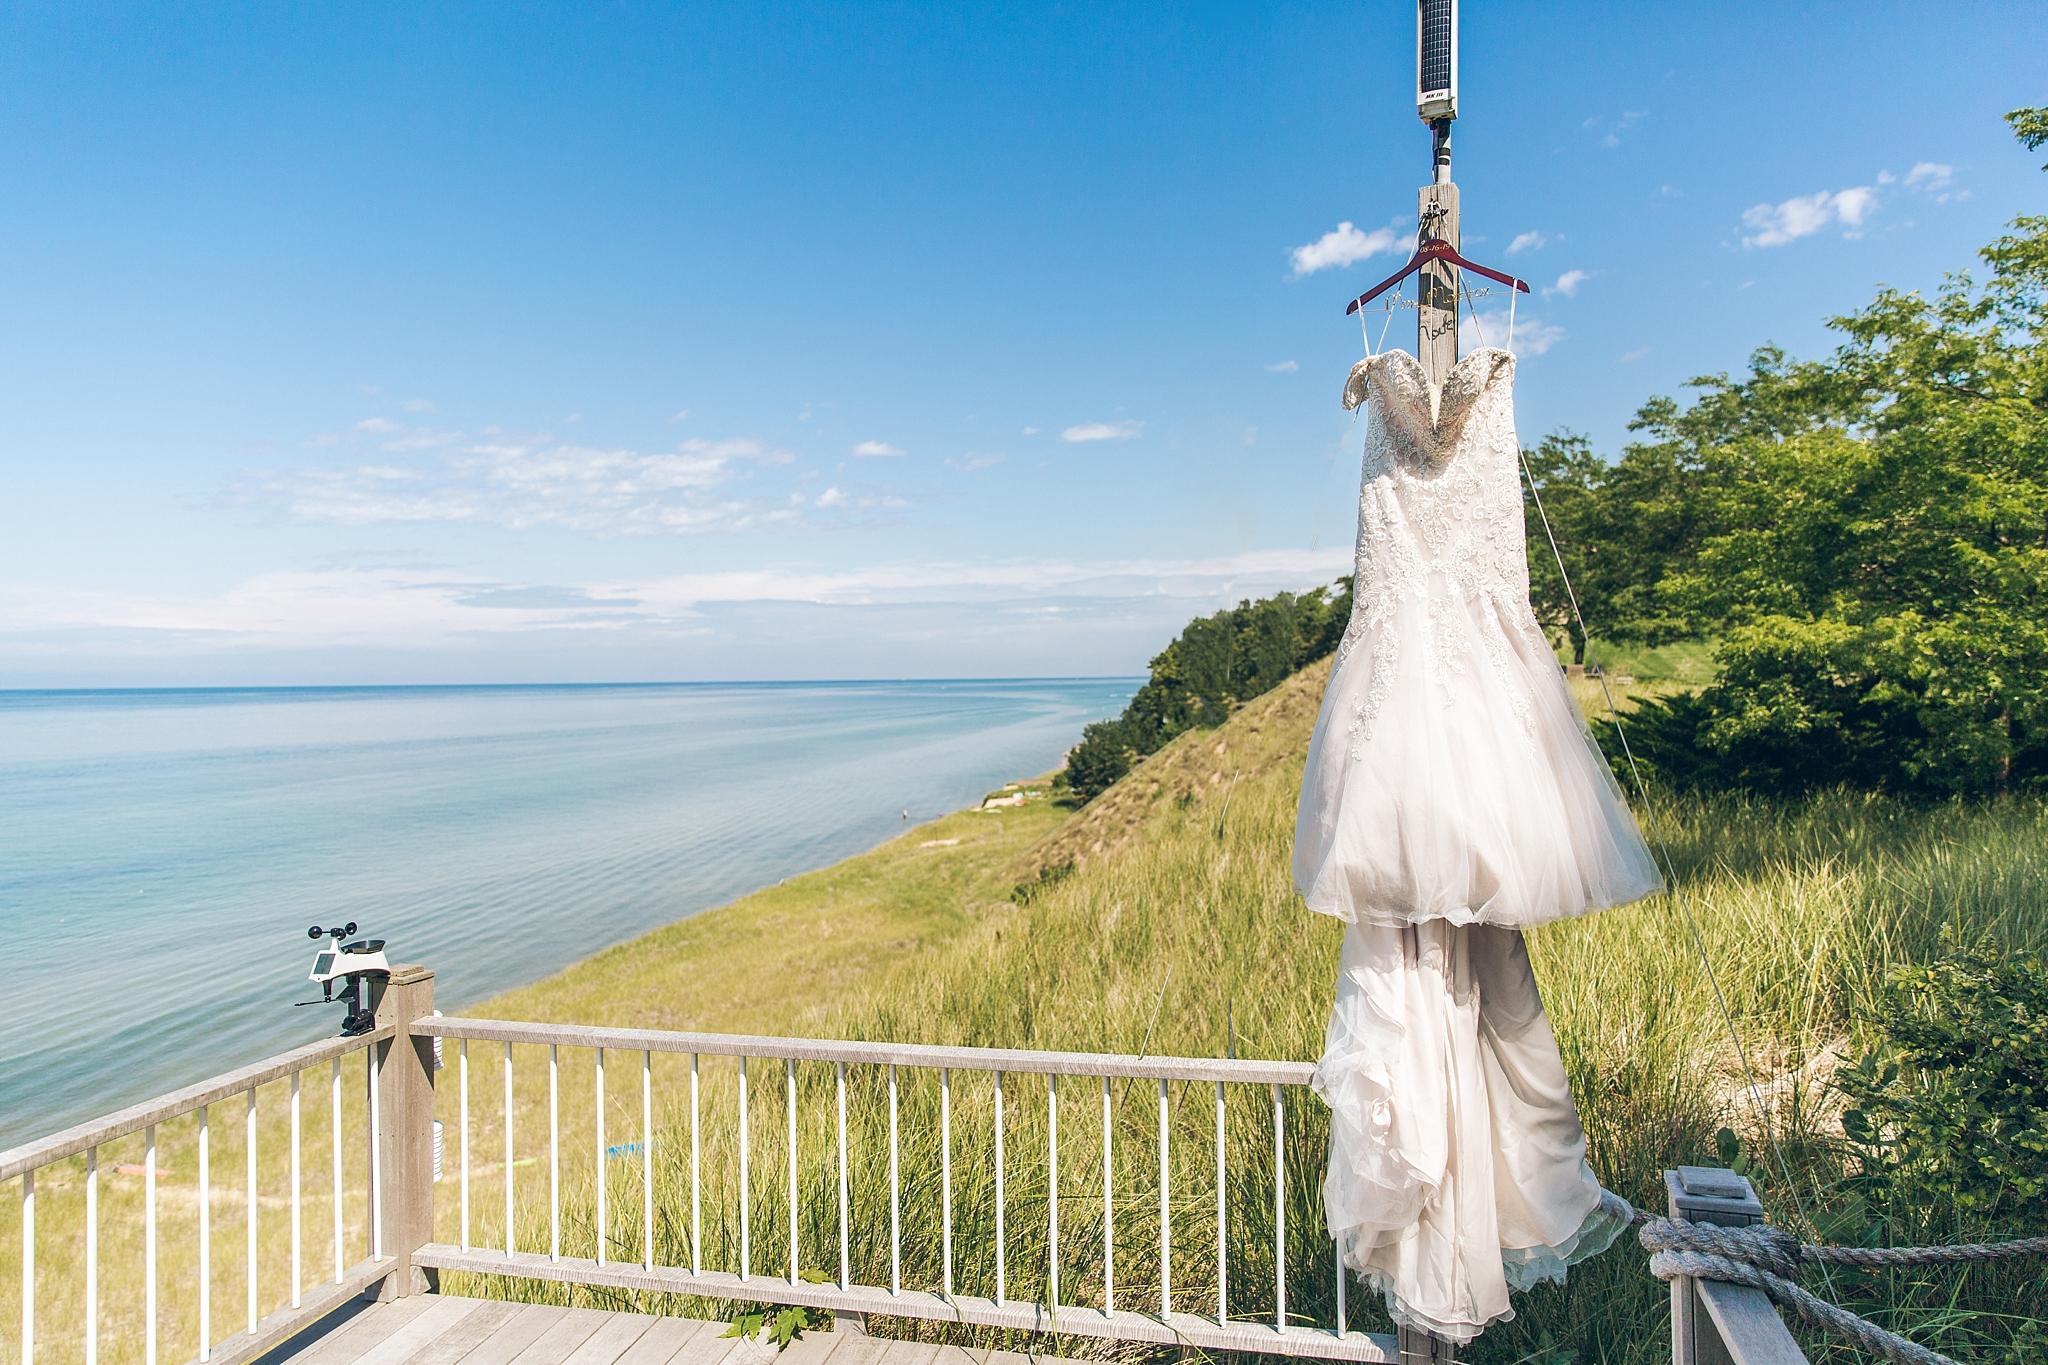 baker-lofts-holland-michigan-wedding-photographer_0296.jpg